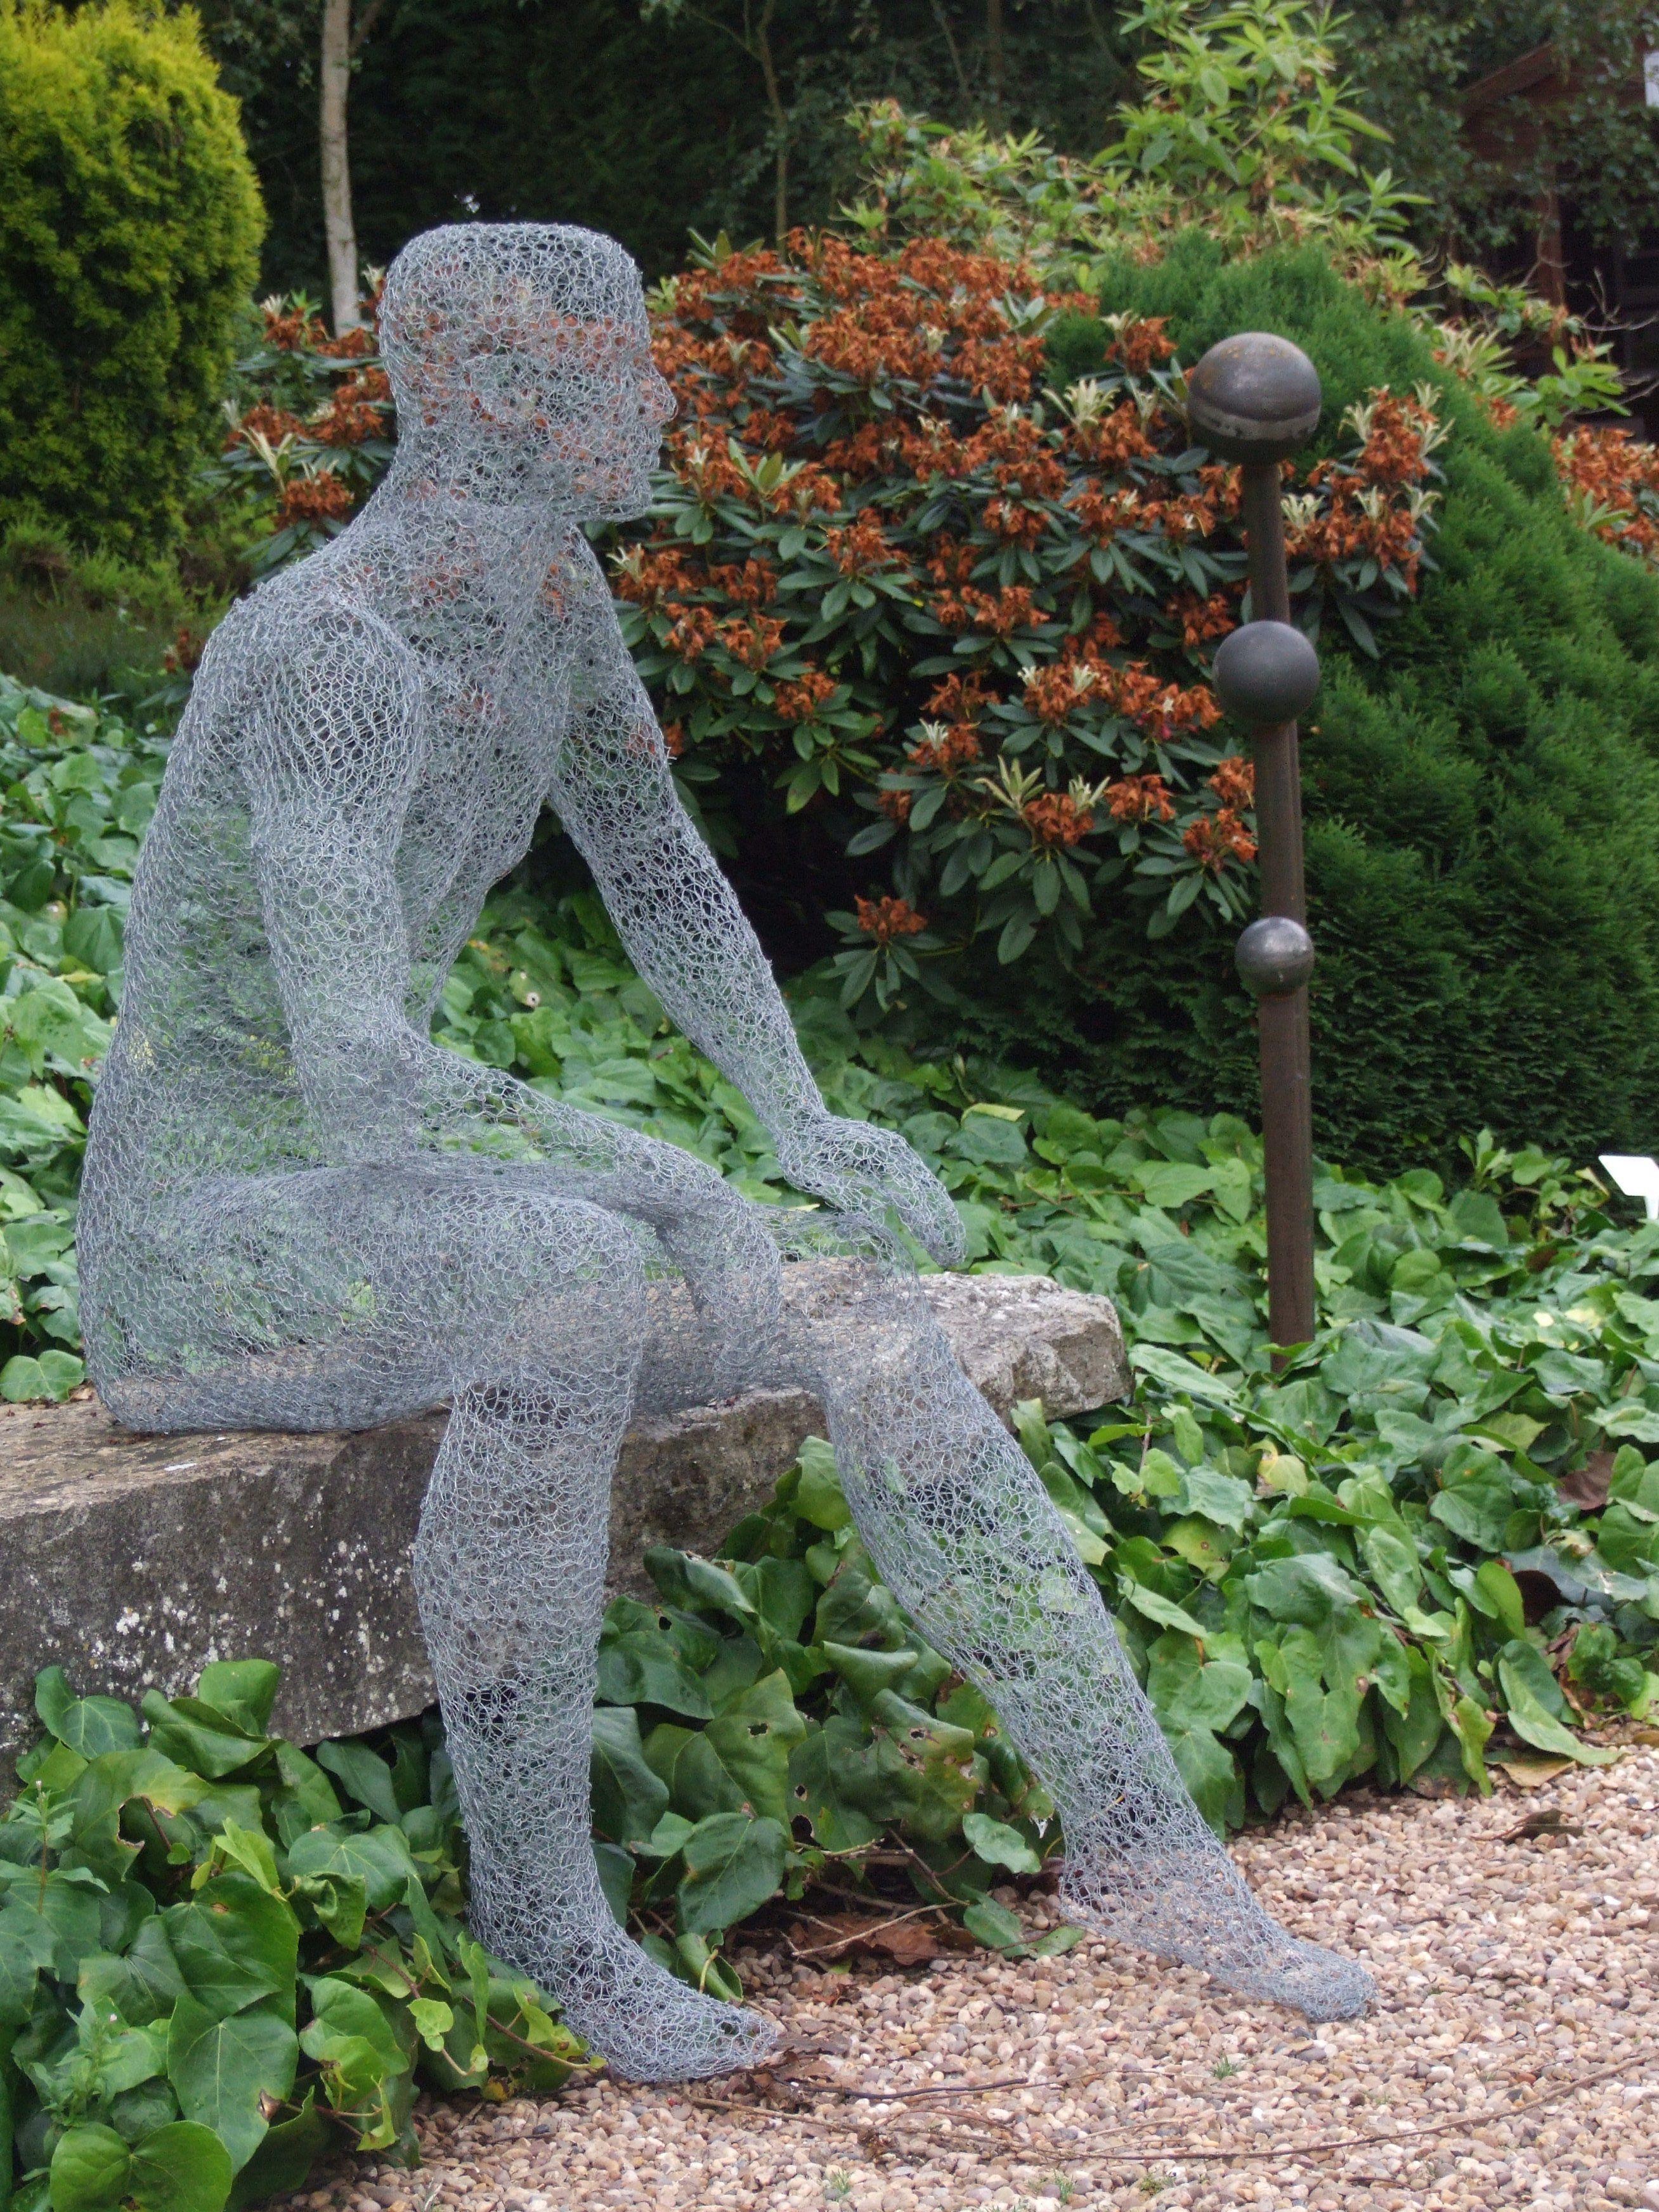 Sculpture Grillage A Poule garden art | celebration of the diversity and vibrancy of